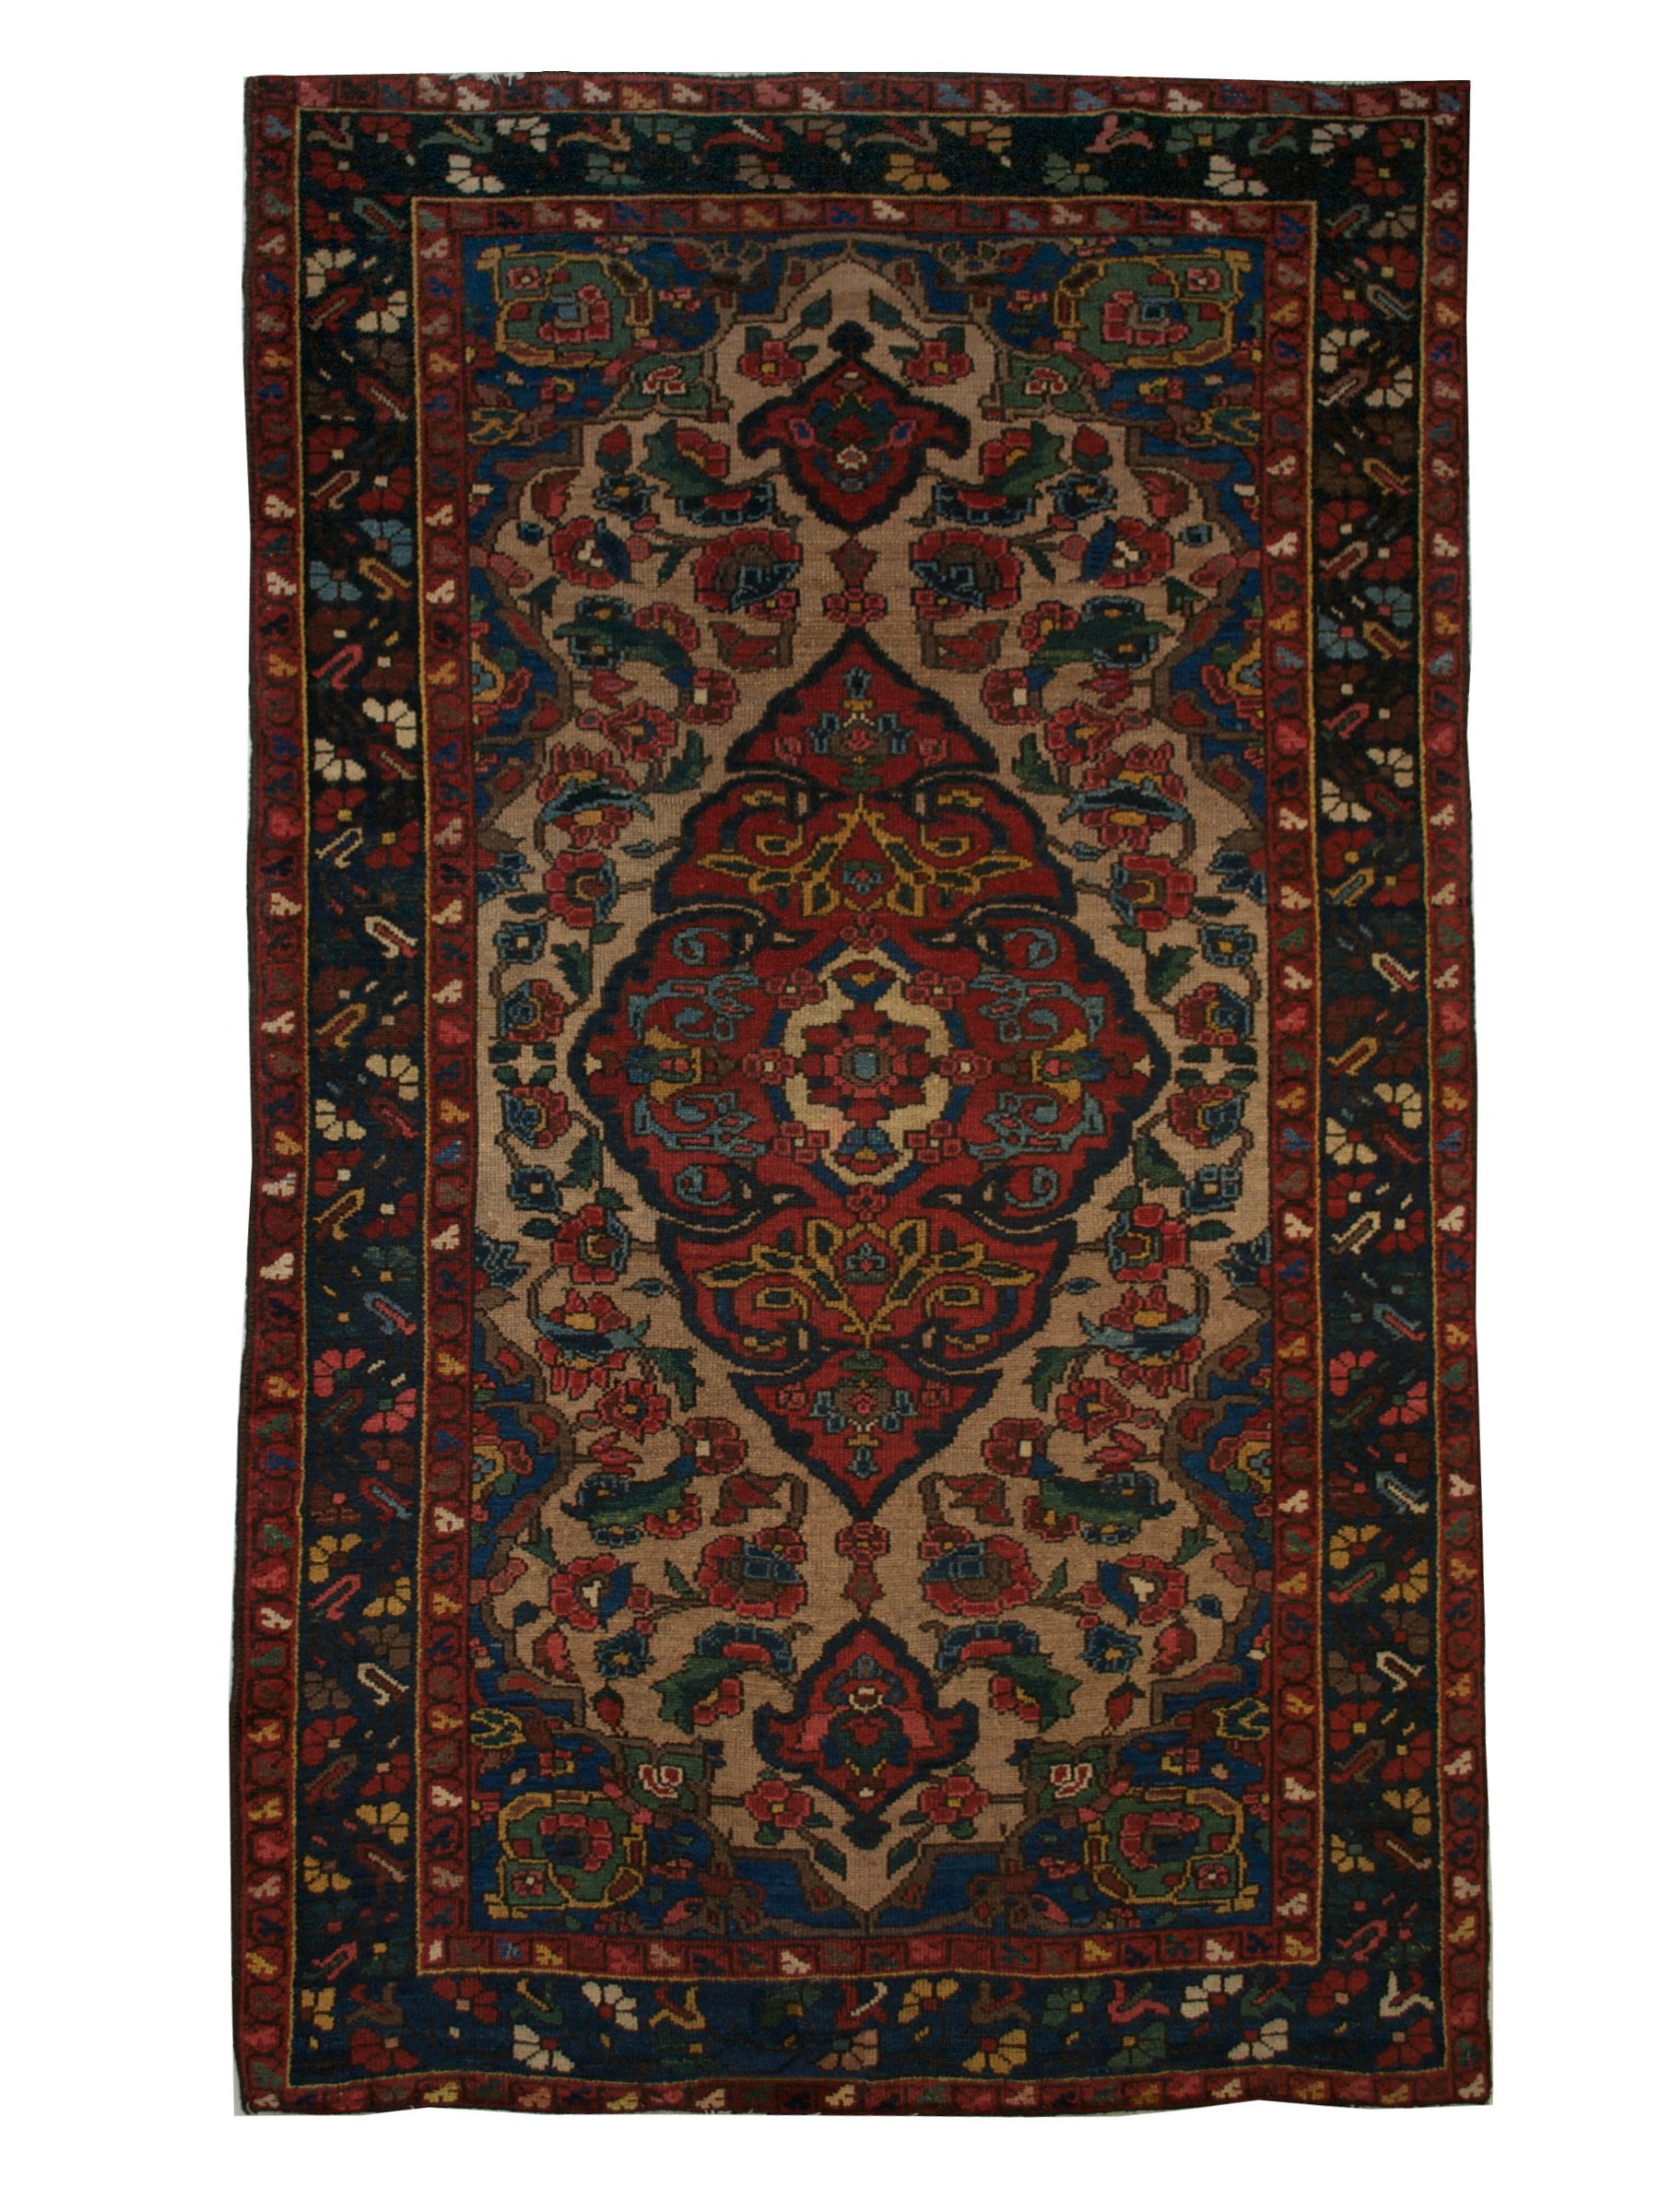 "Antique Persian Bakhtiari 3' 11"" x 6' 7"" Handmade Wool Area Rug - Shabahang Royal Carpet"